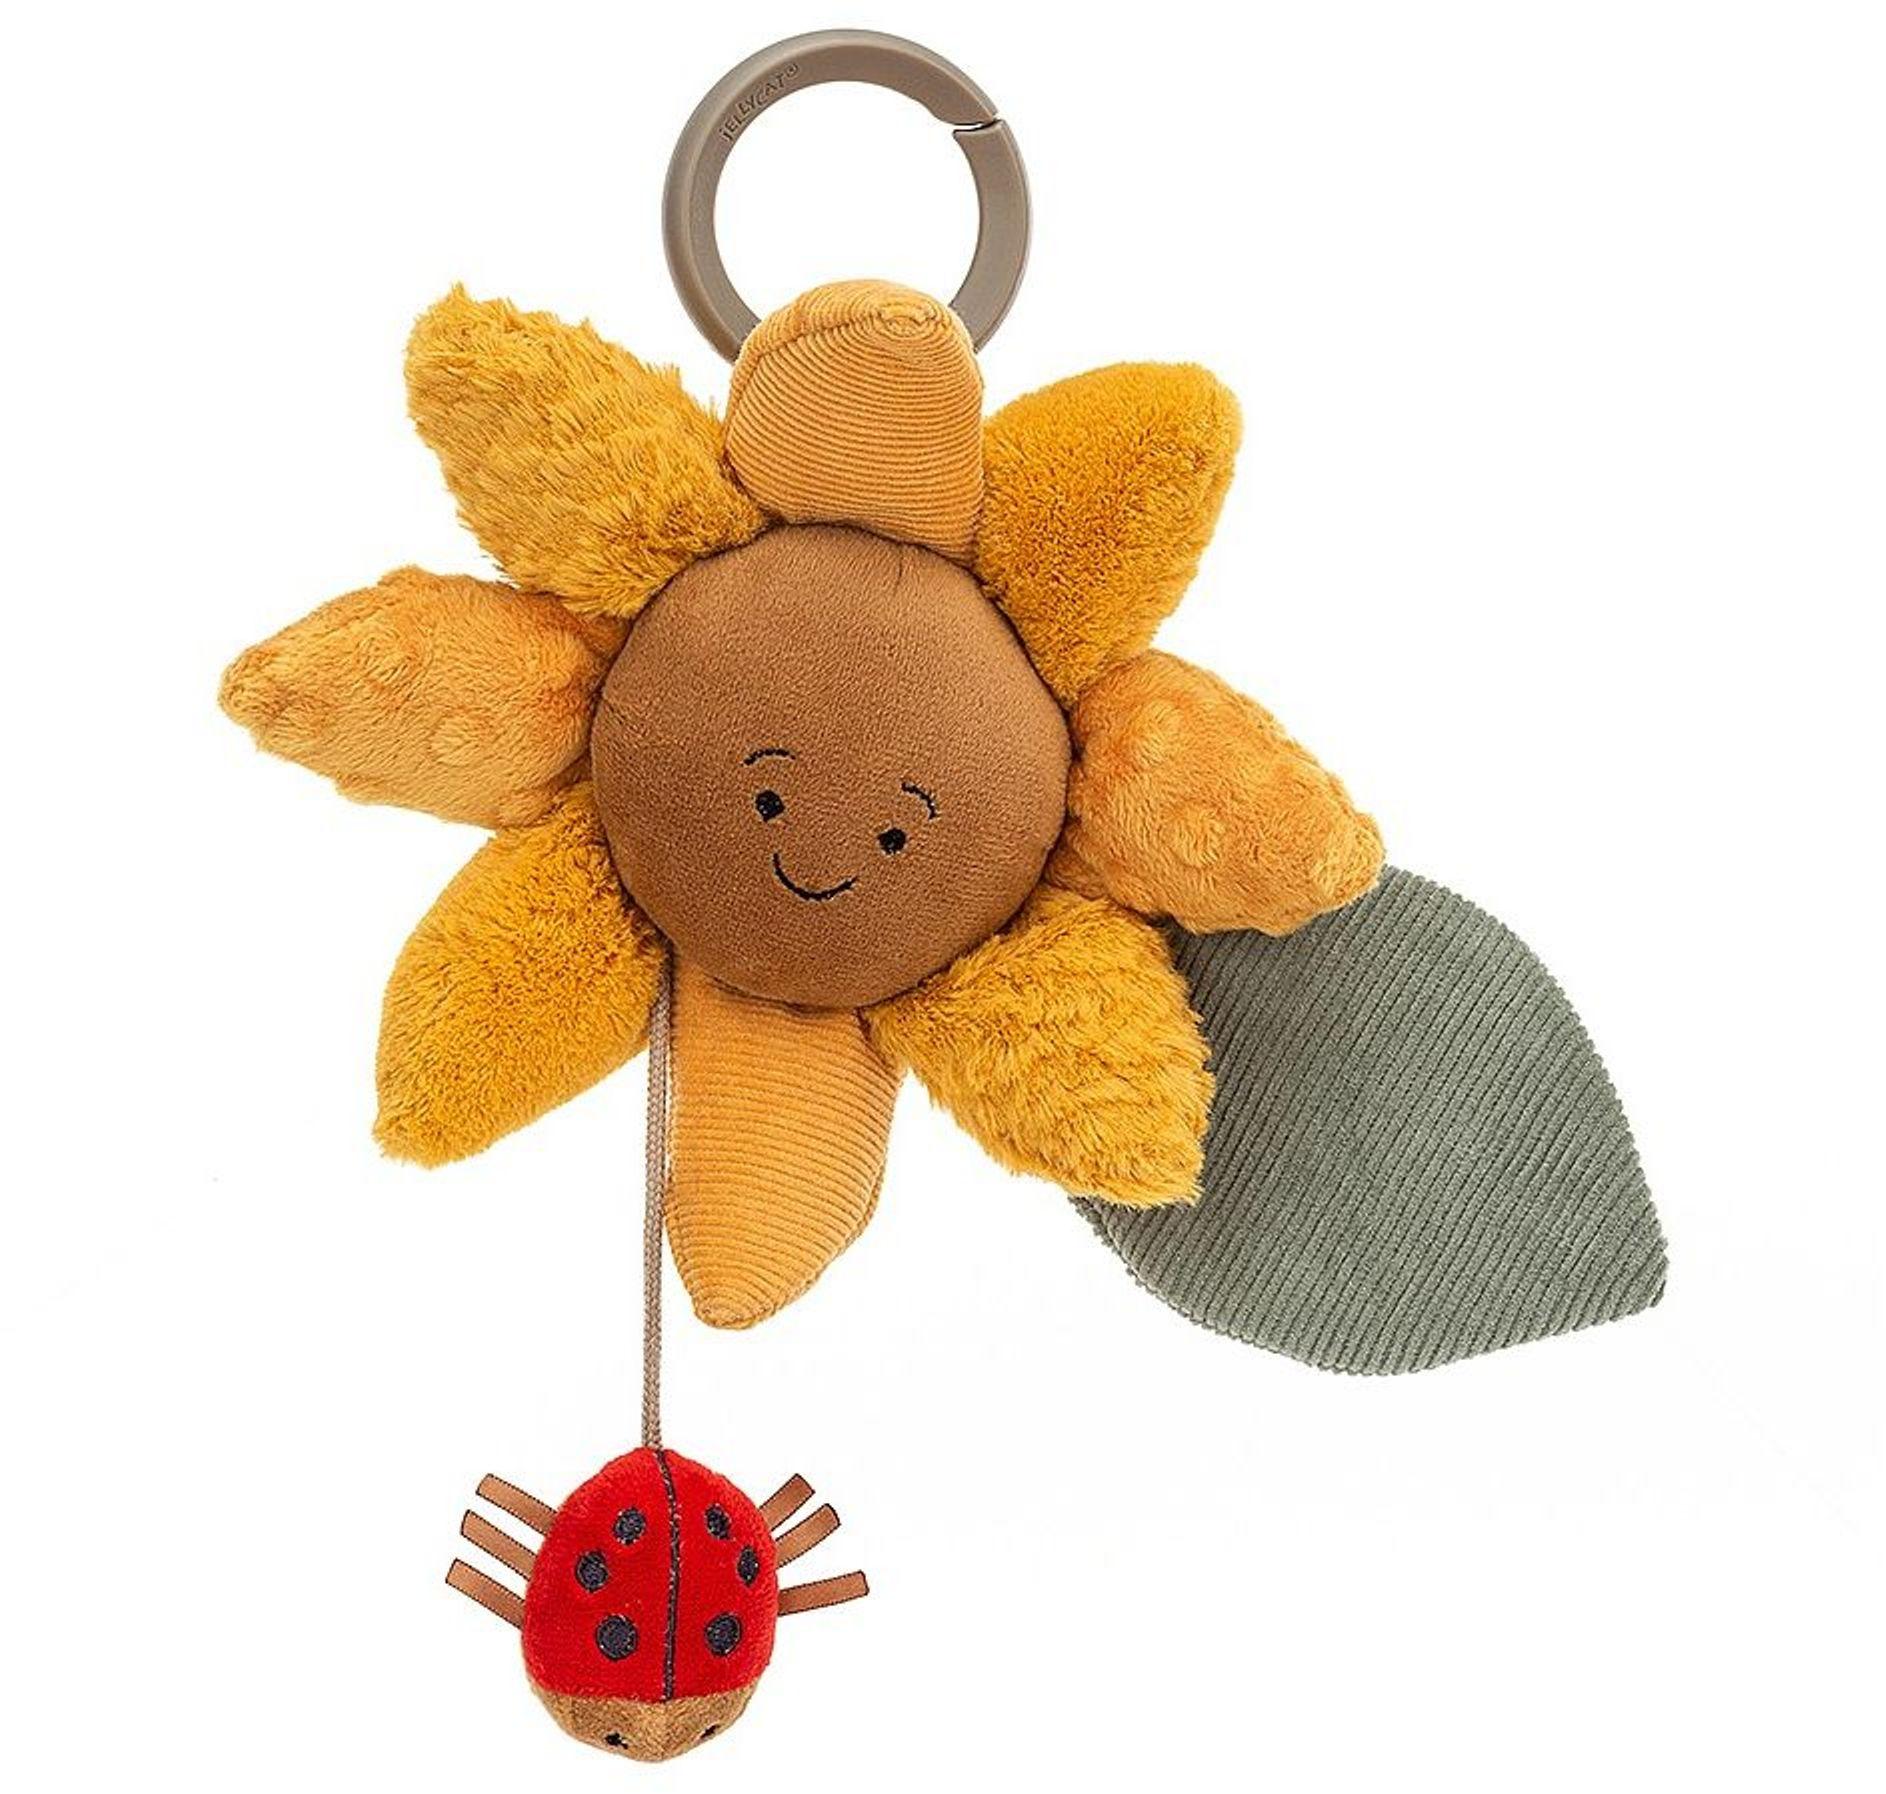 Jellycat Activity Toy Fleury Sunflower 20 x 20 cm